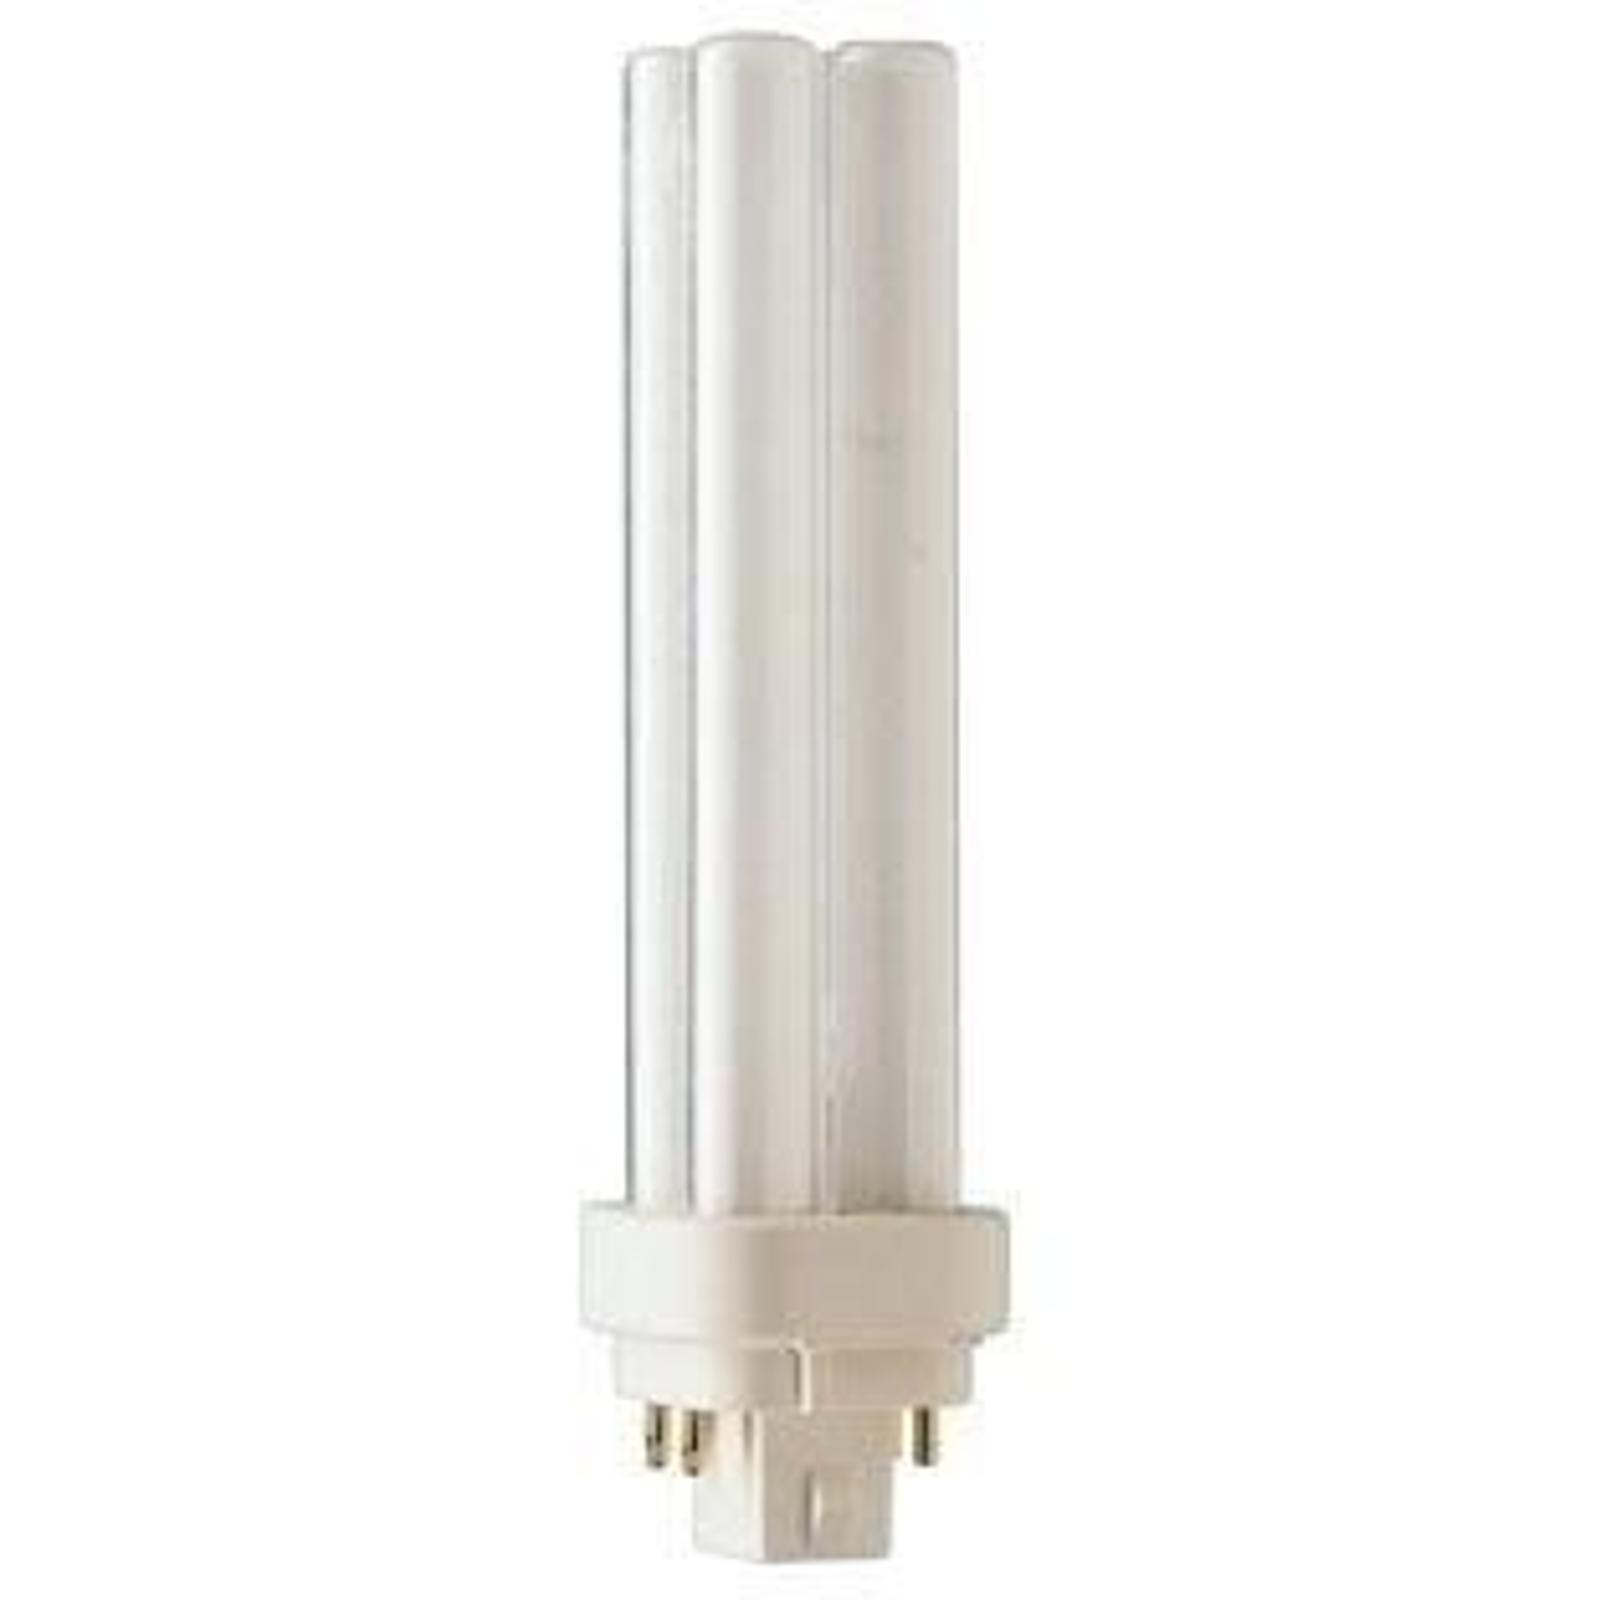 G24q 18W 827 Kompaktleuchtstofflampe DULUX D/E